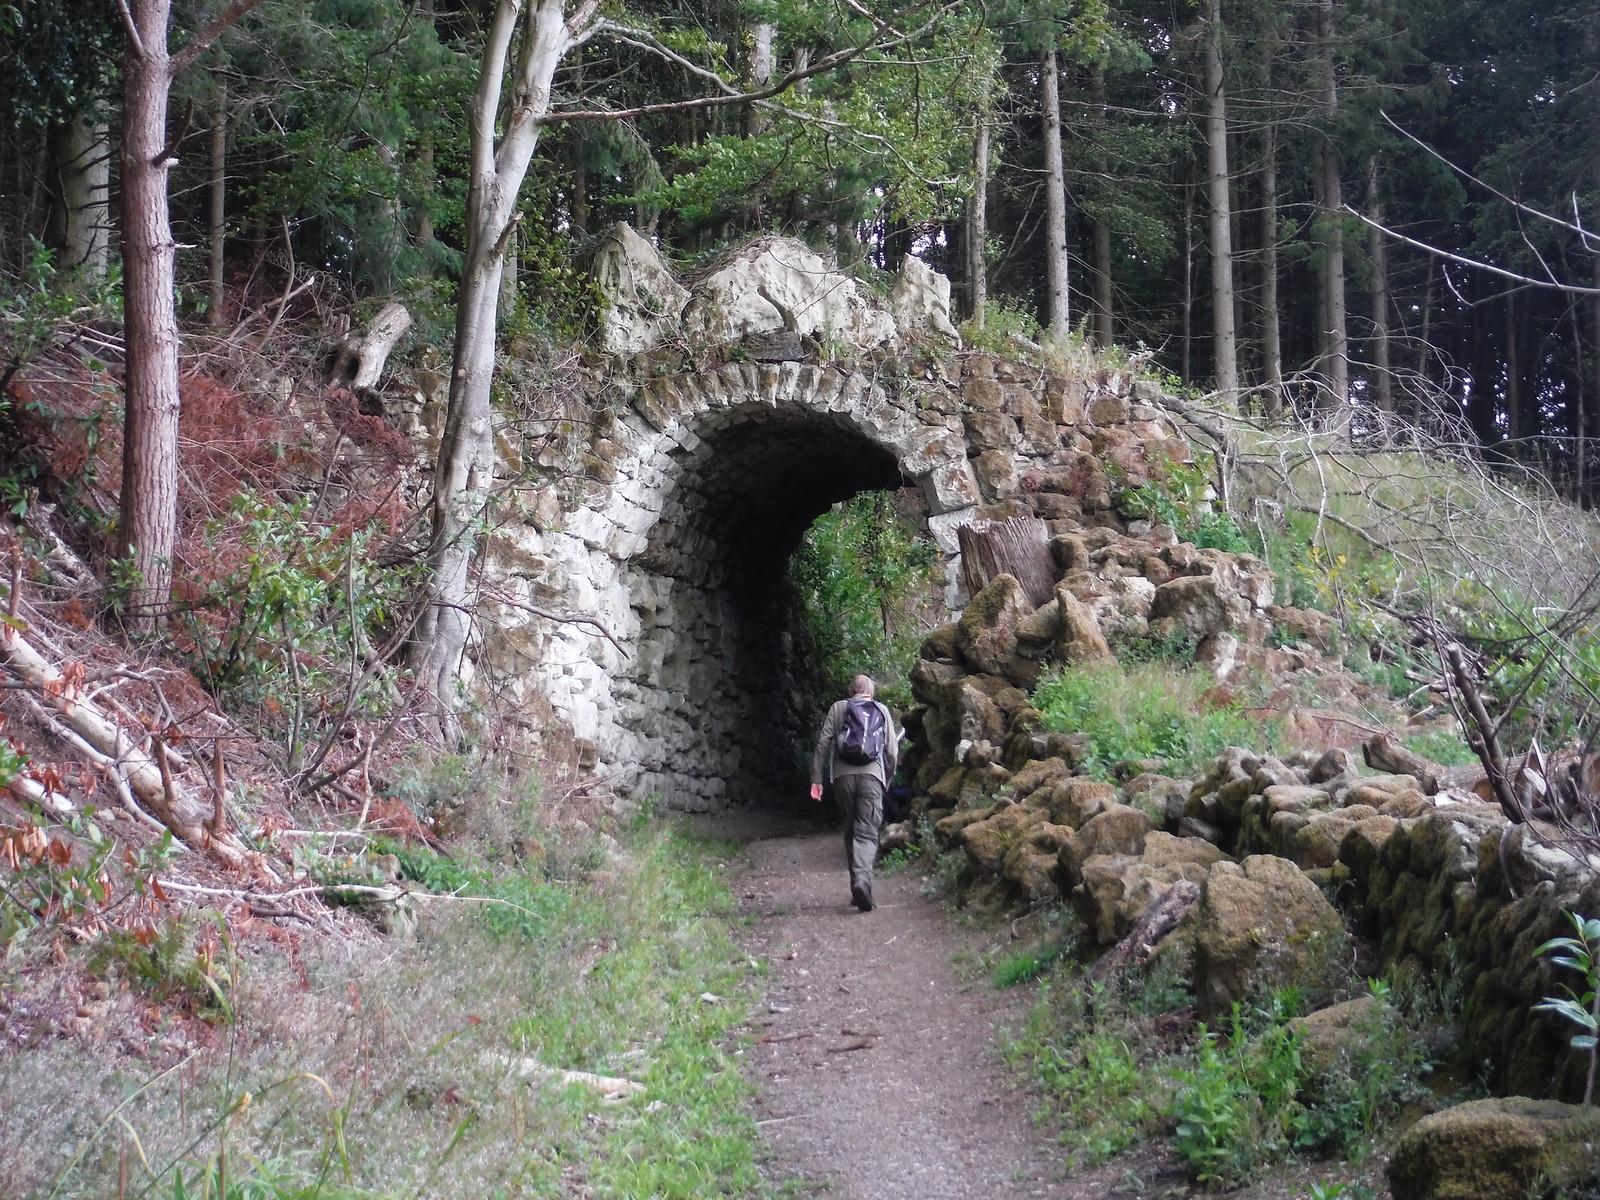 Remnants of historic entrance gate, Old Wardour Castle SWC Walk 252 Tisbury Circular via Donhead St. Andrew